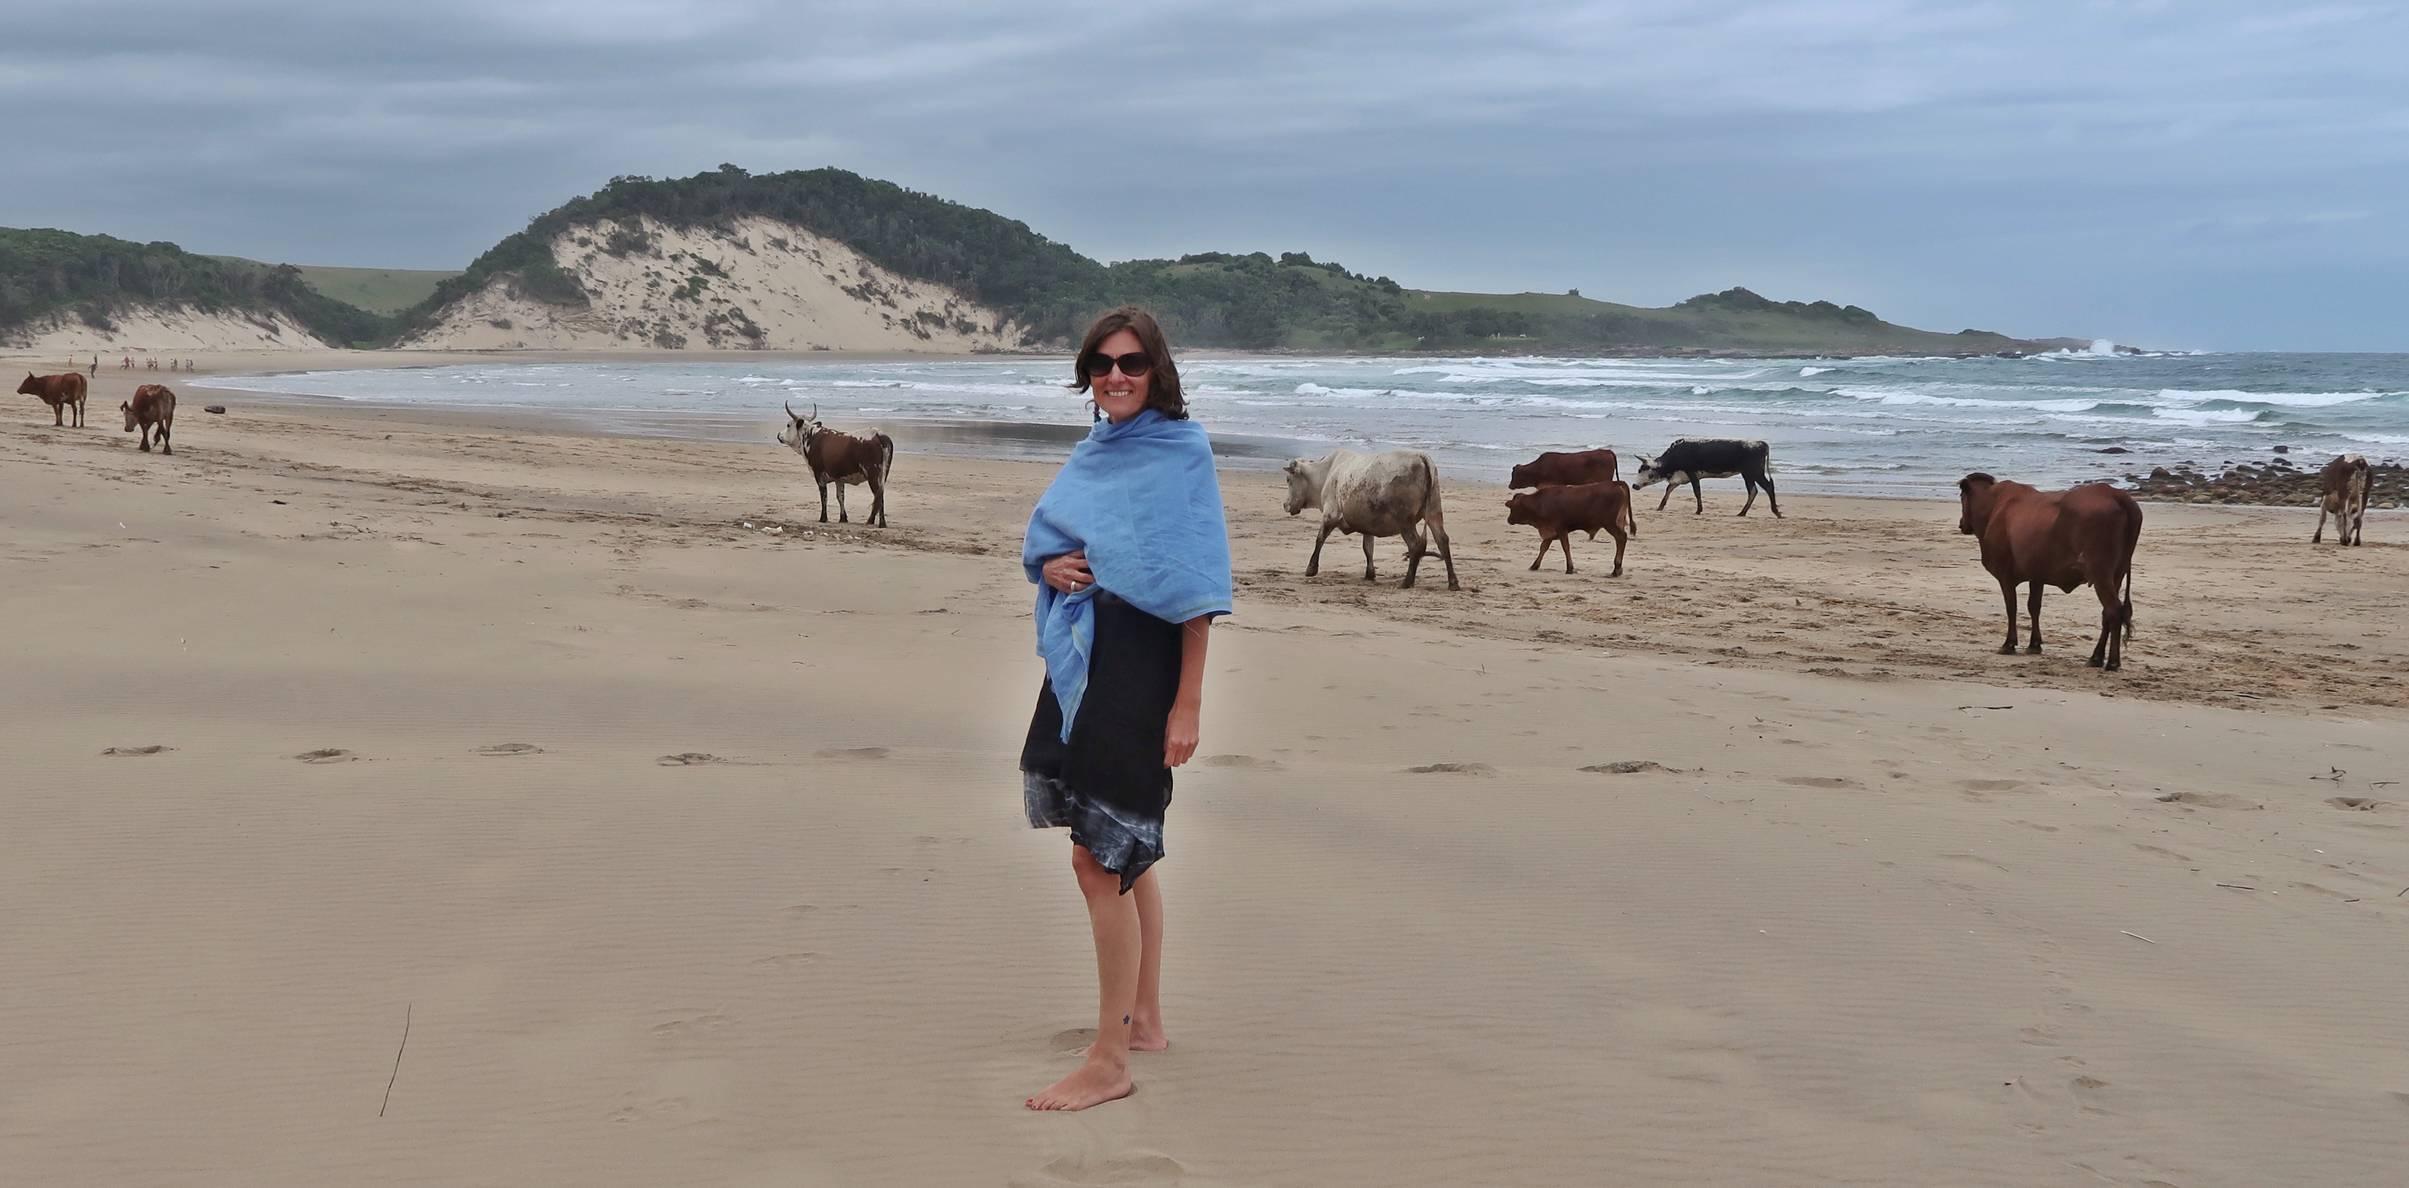 wild coast south africa accommodation protea ridge